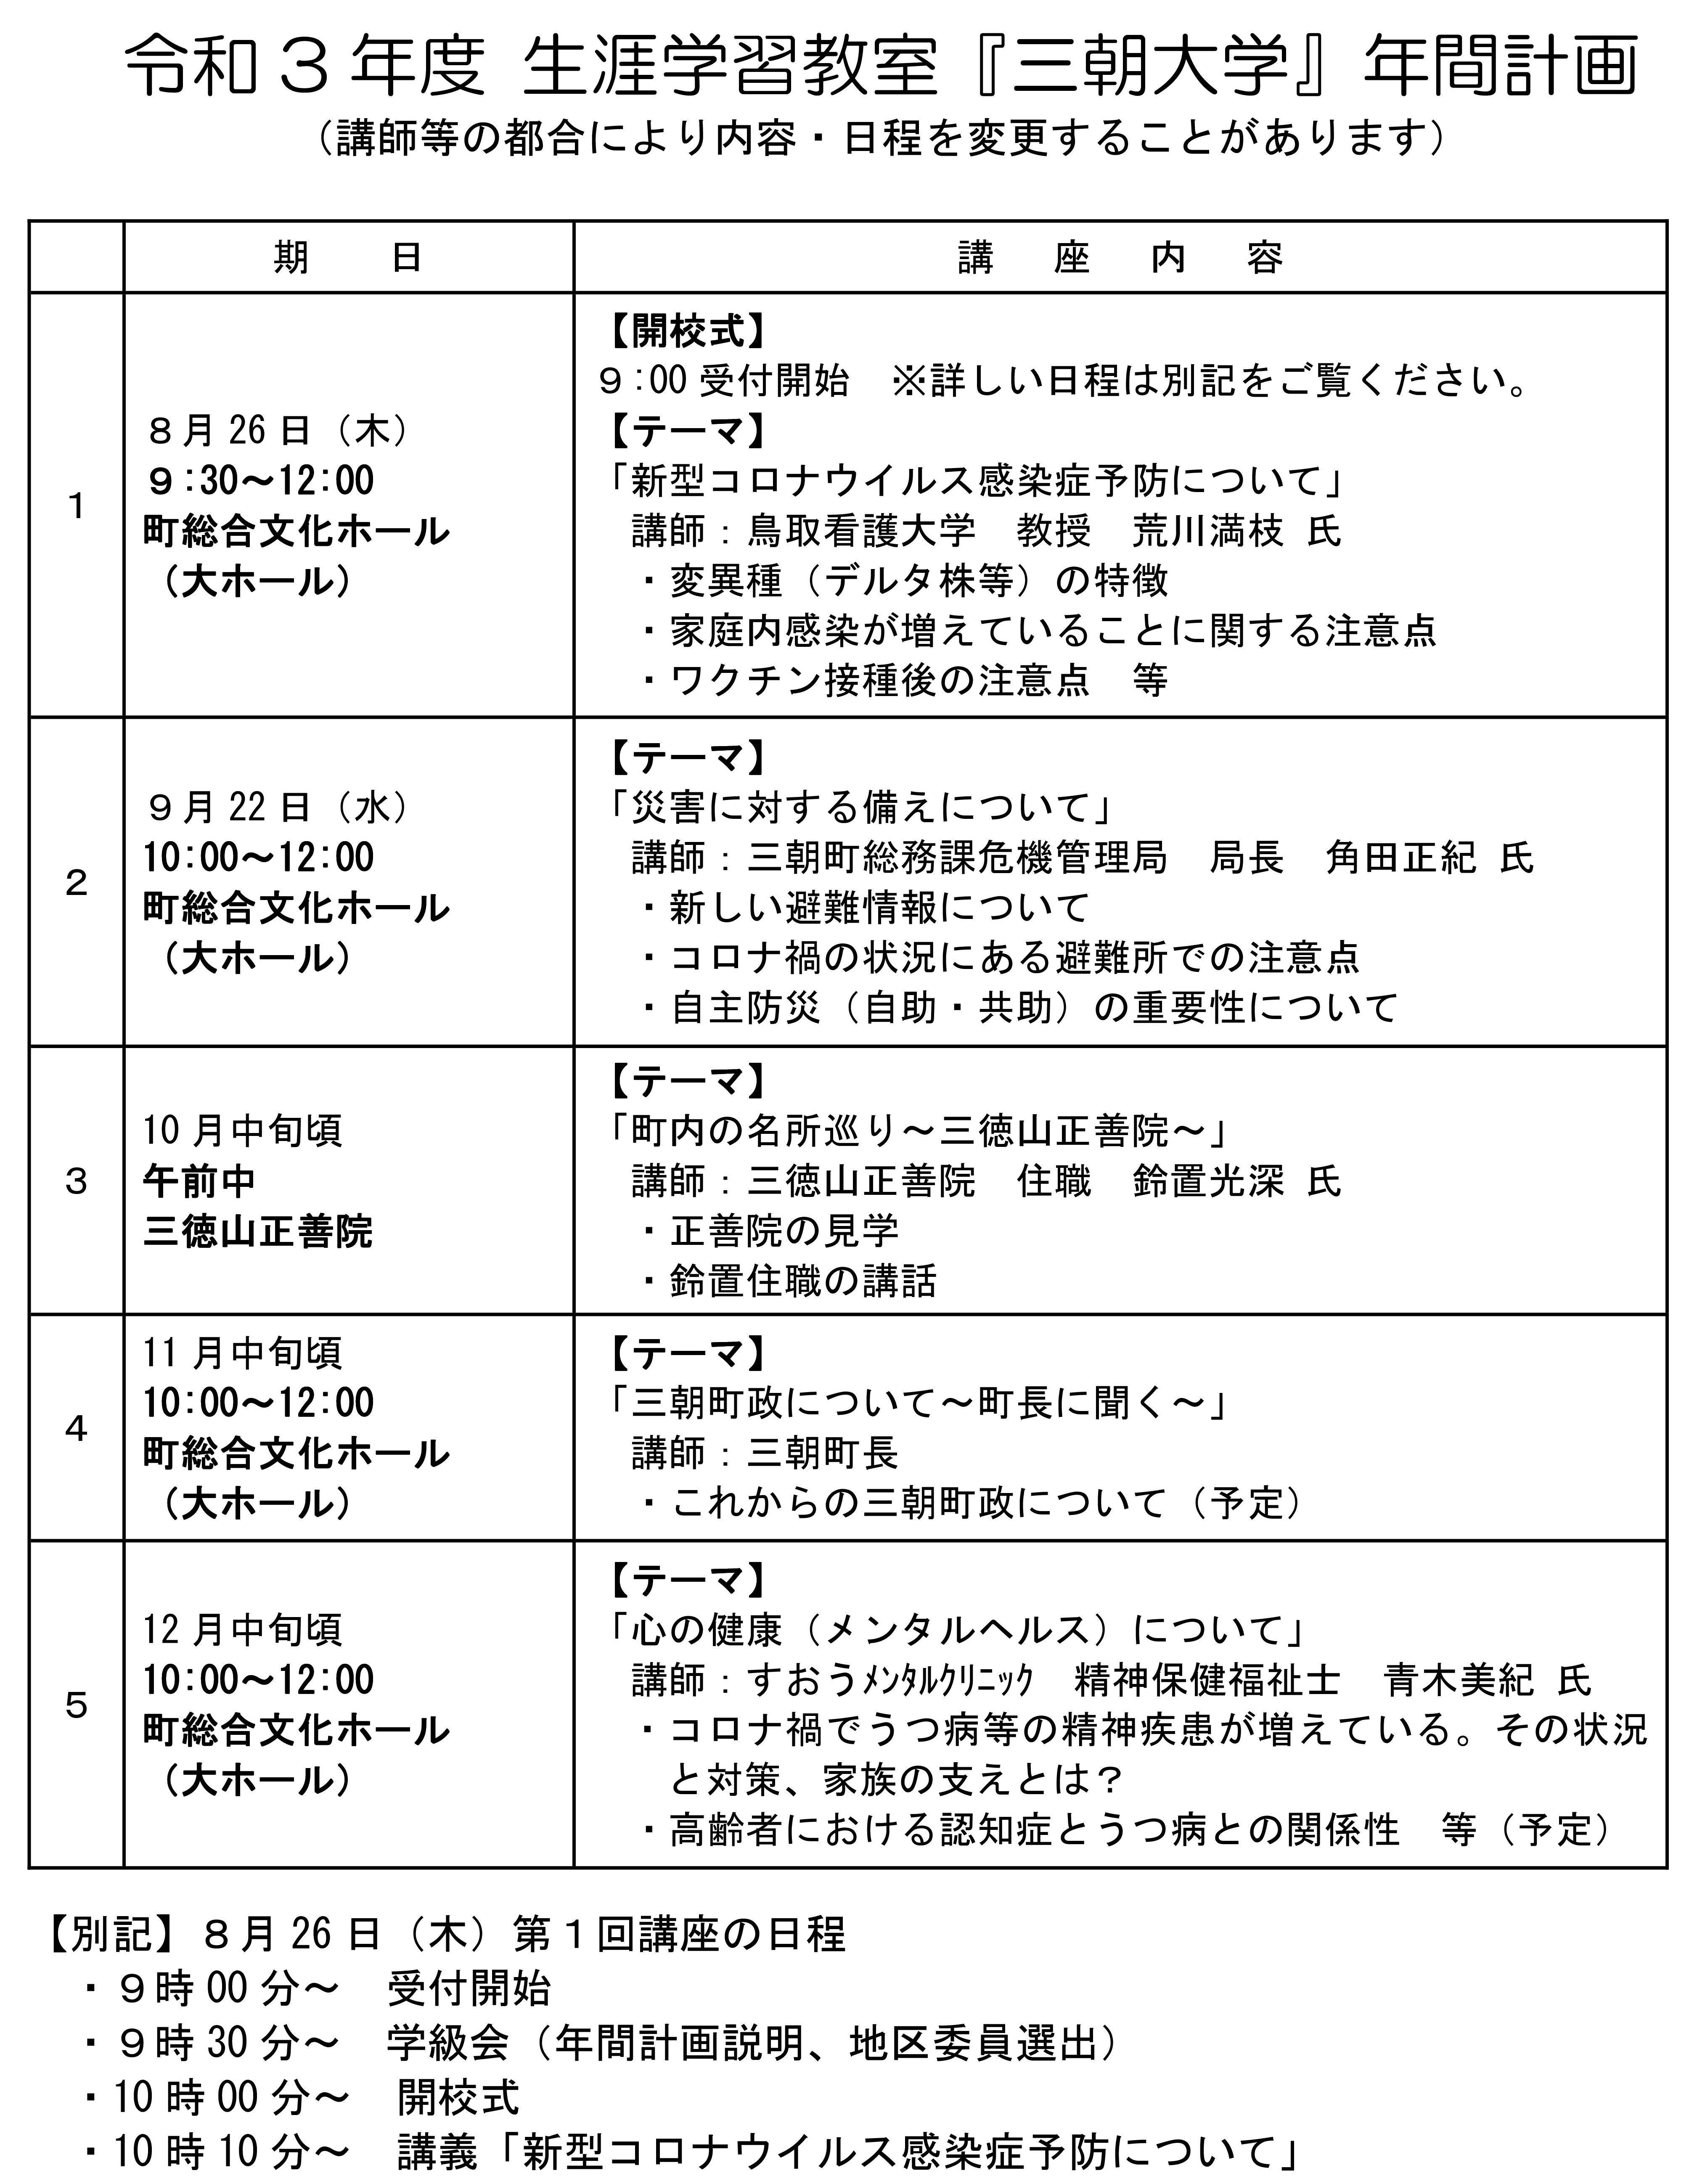 R3三朝大学日程